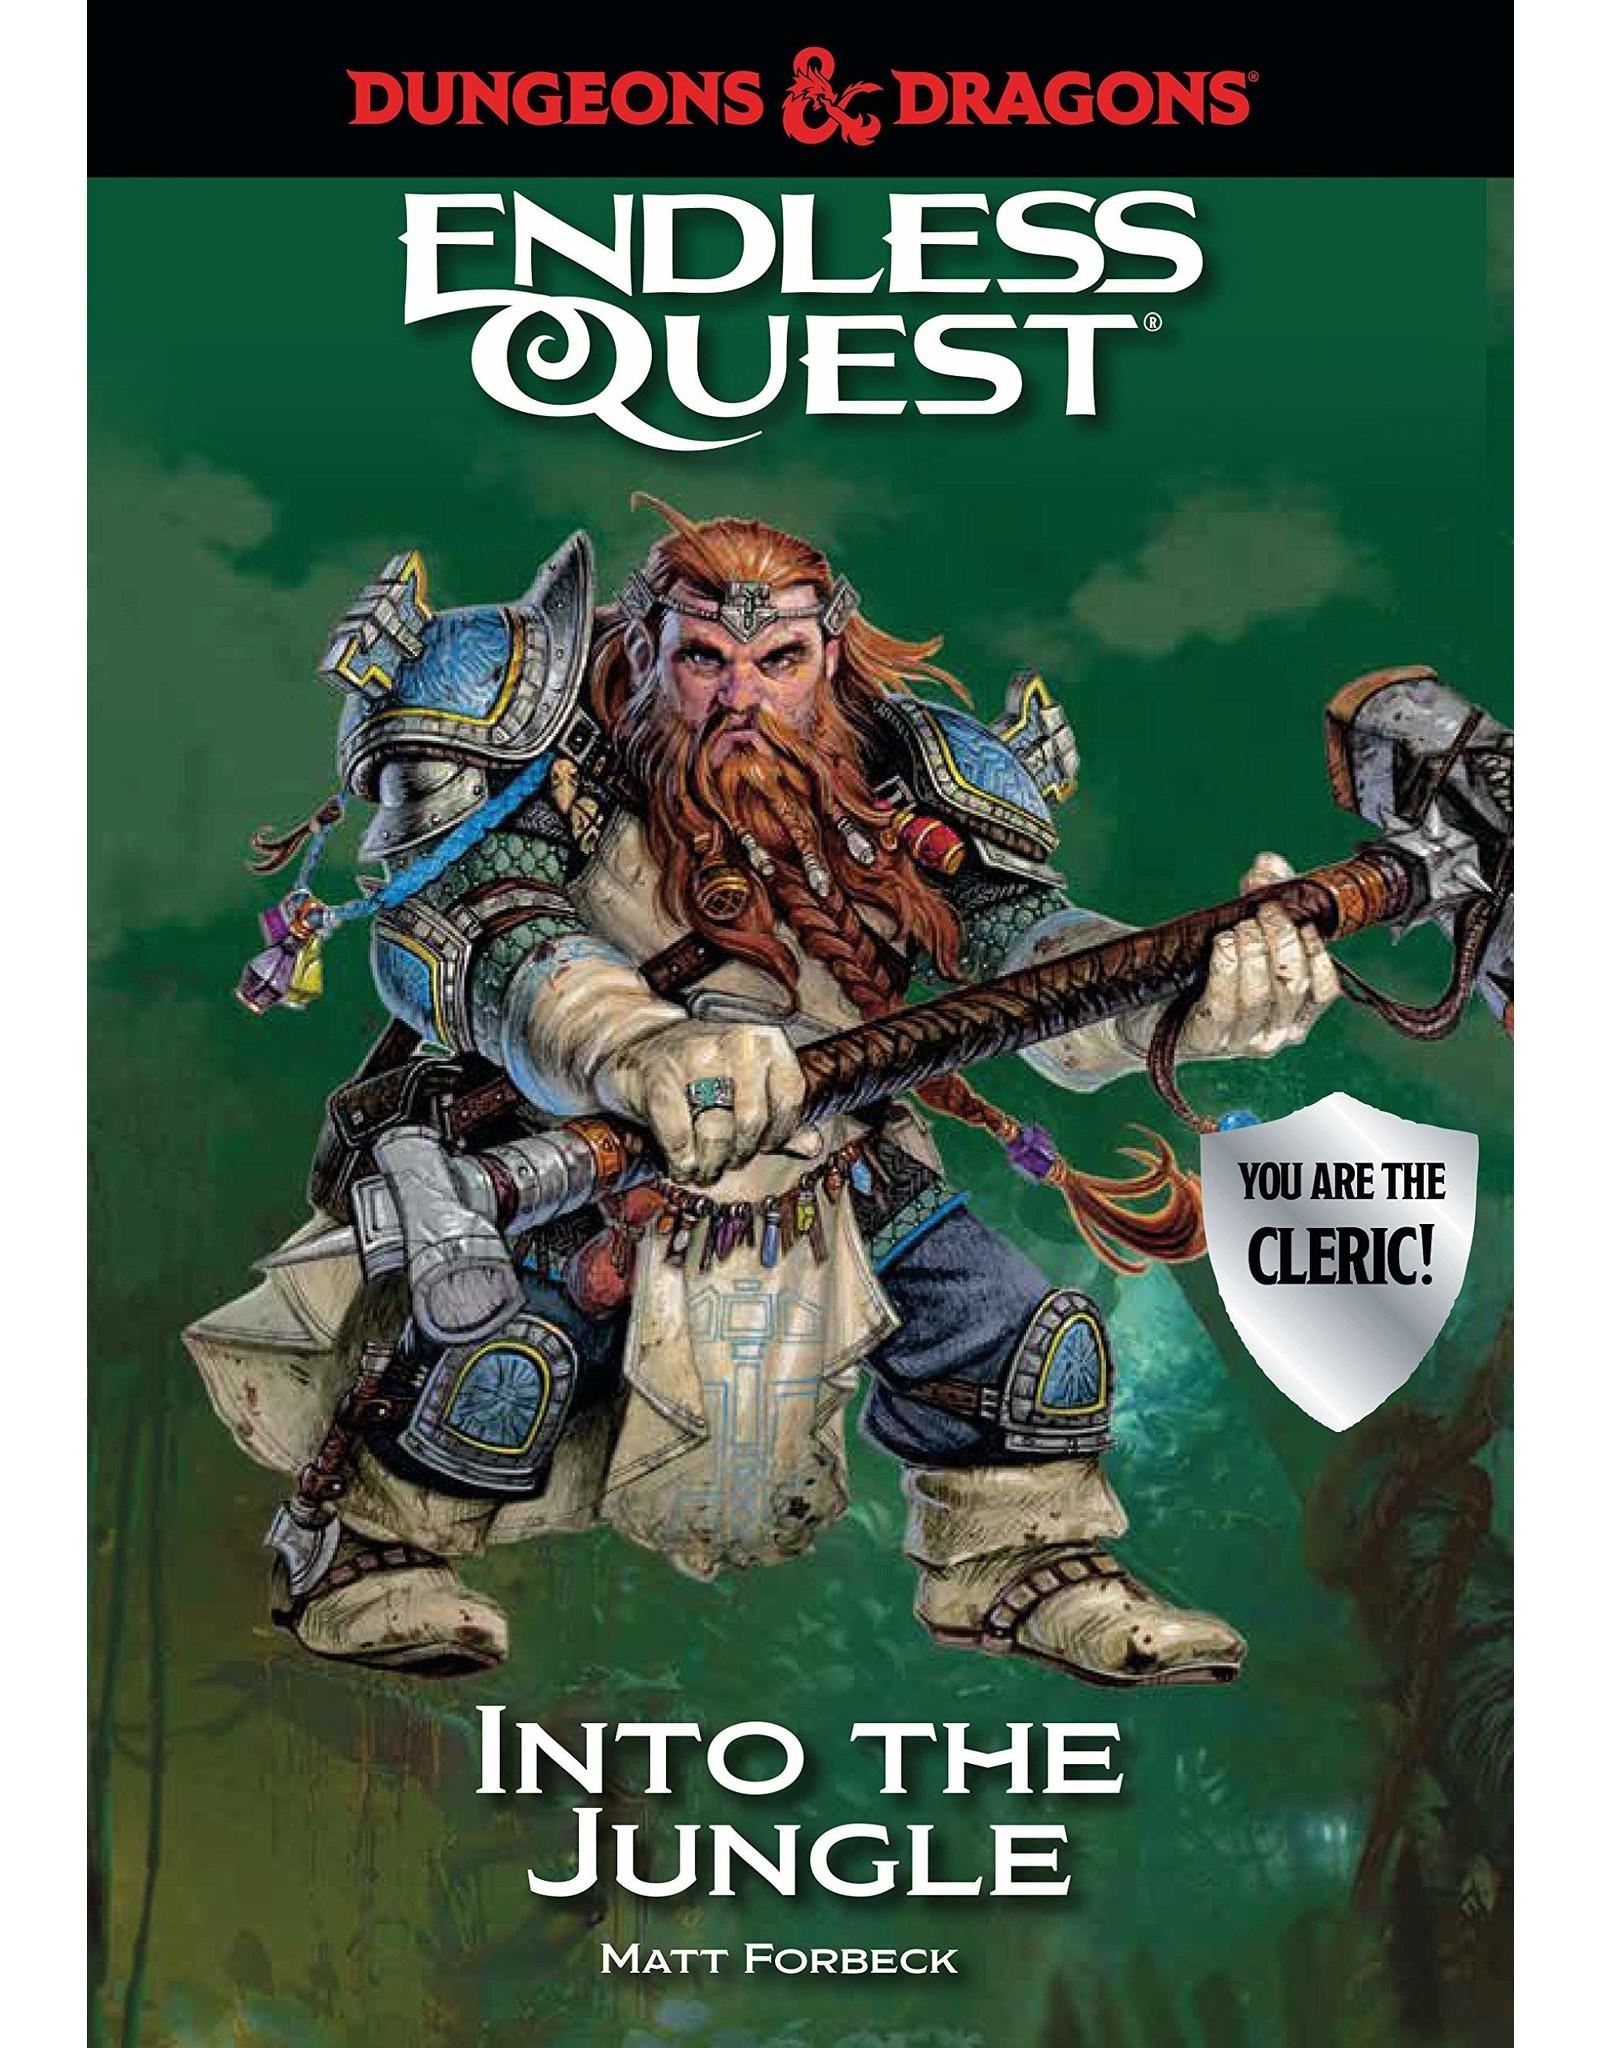 Random House D&D: An Endless Quest Adv - Into the Jungle SC